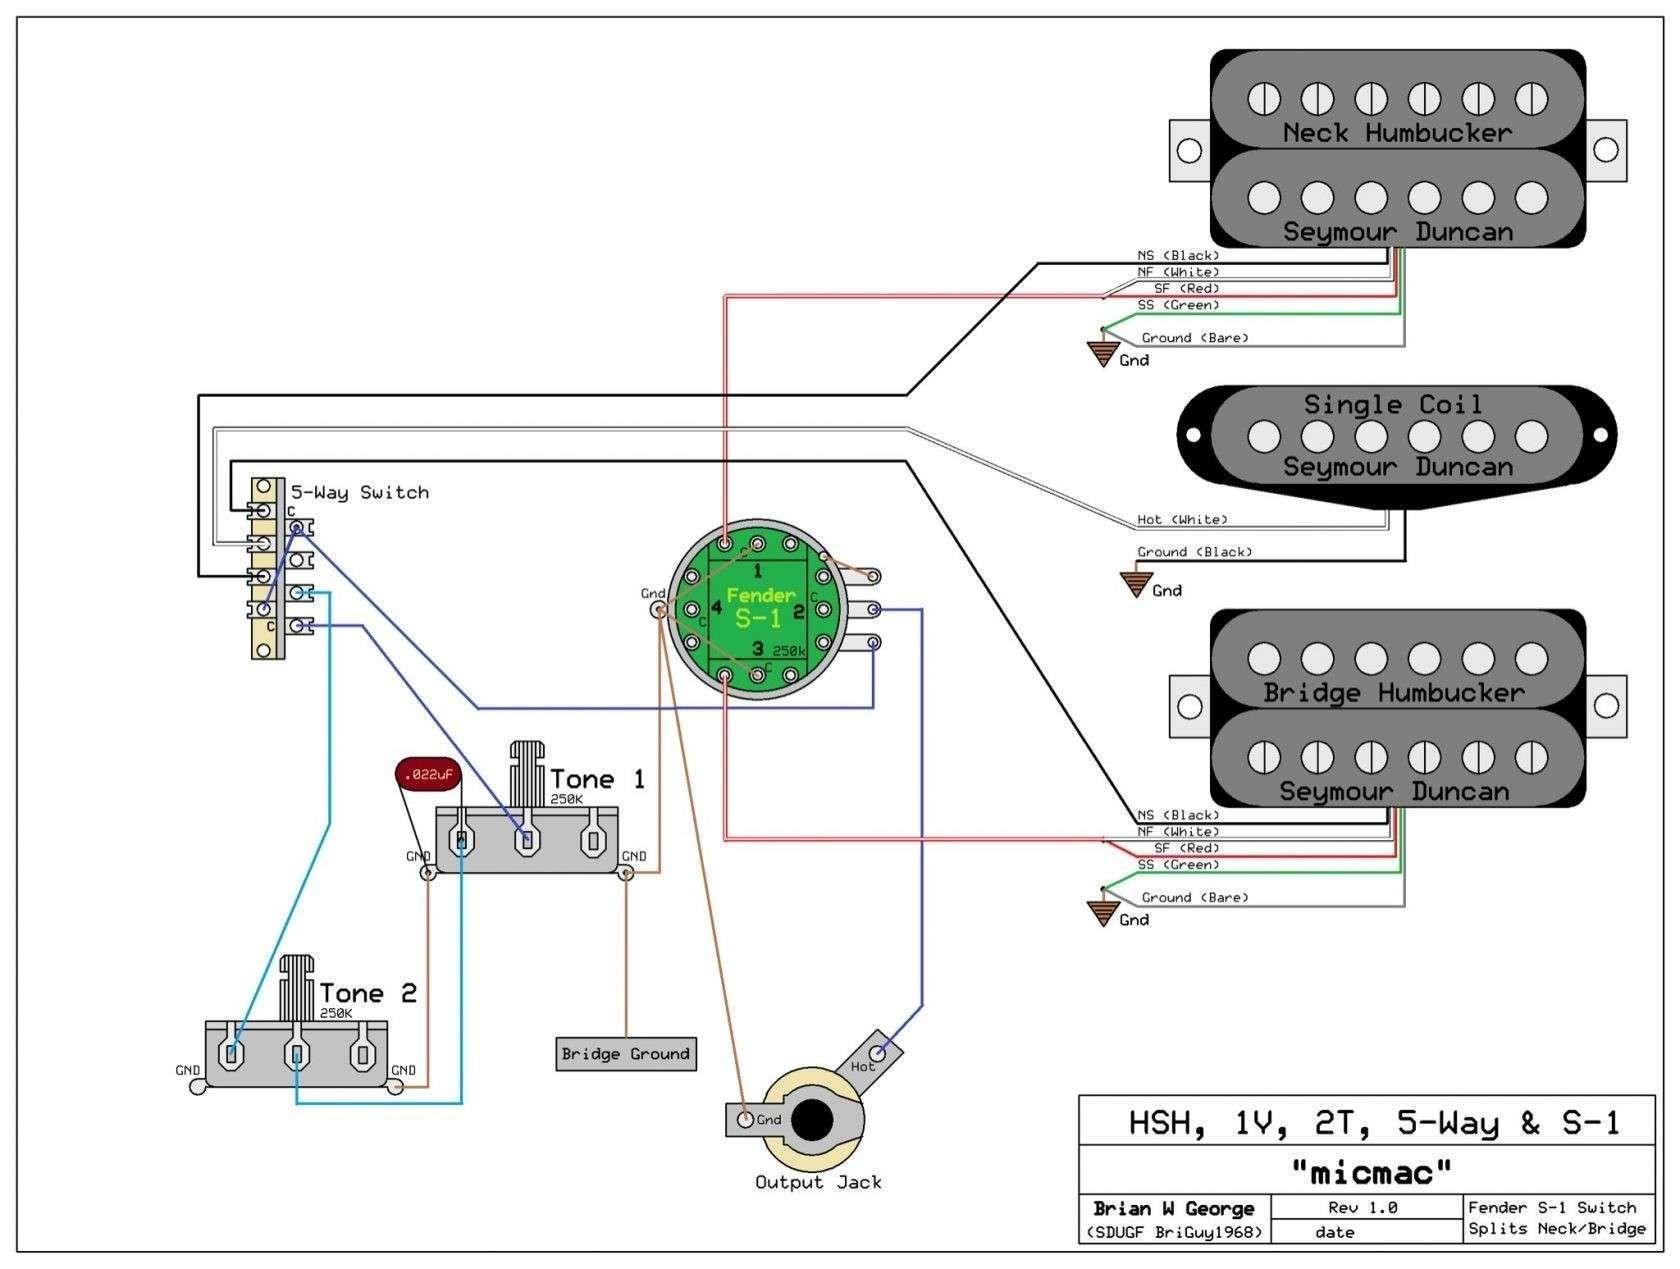 Wiring Diagram Guitar Telecaster, Three way switch